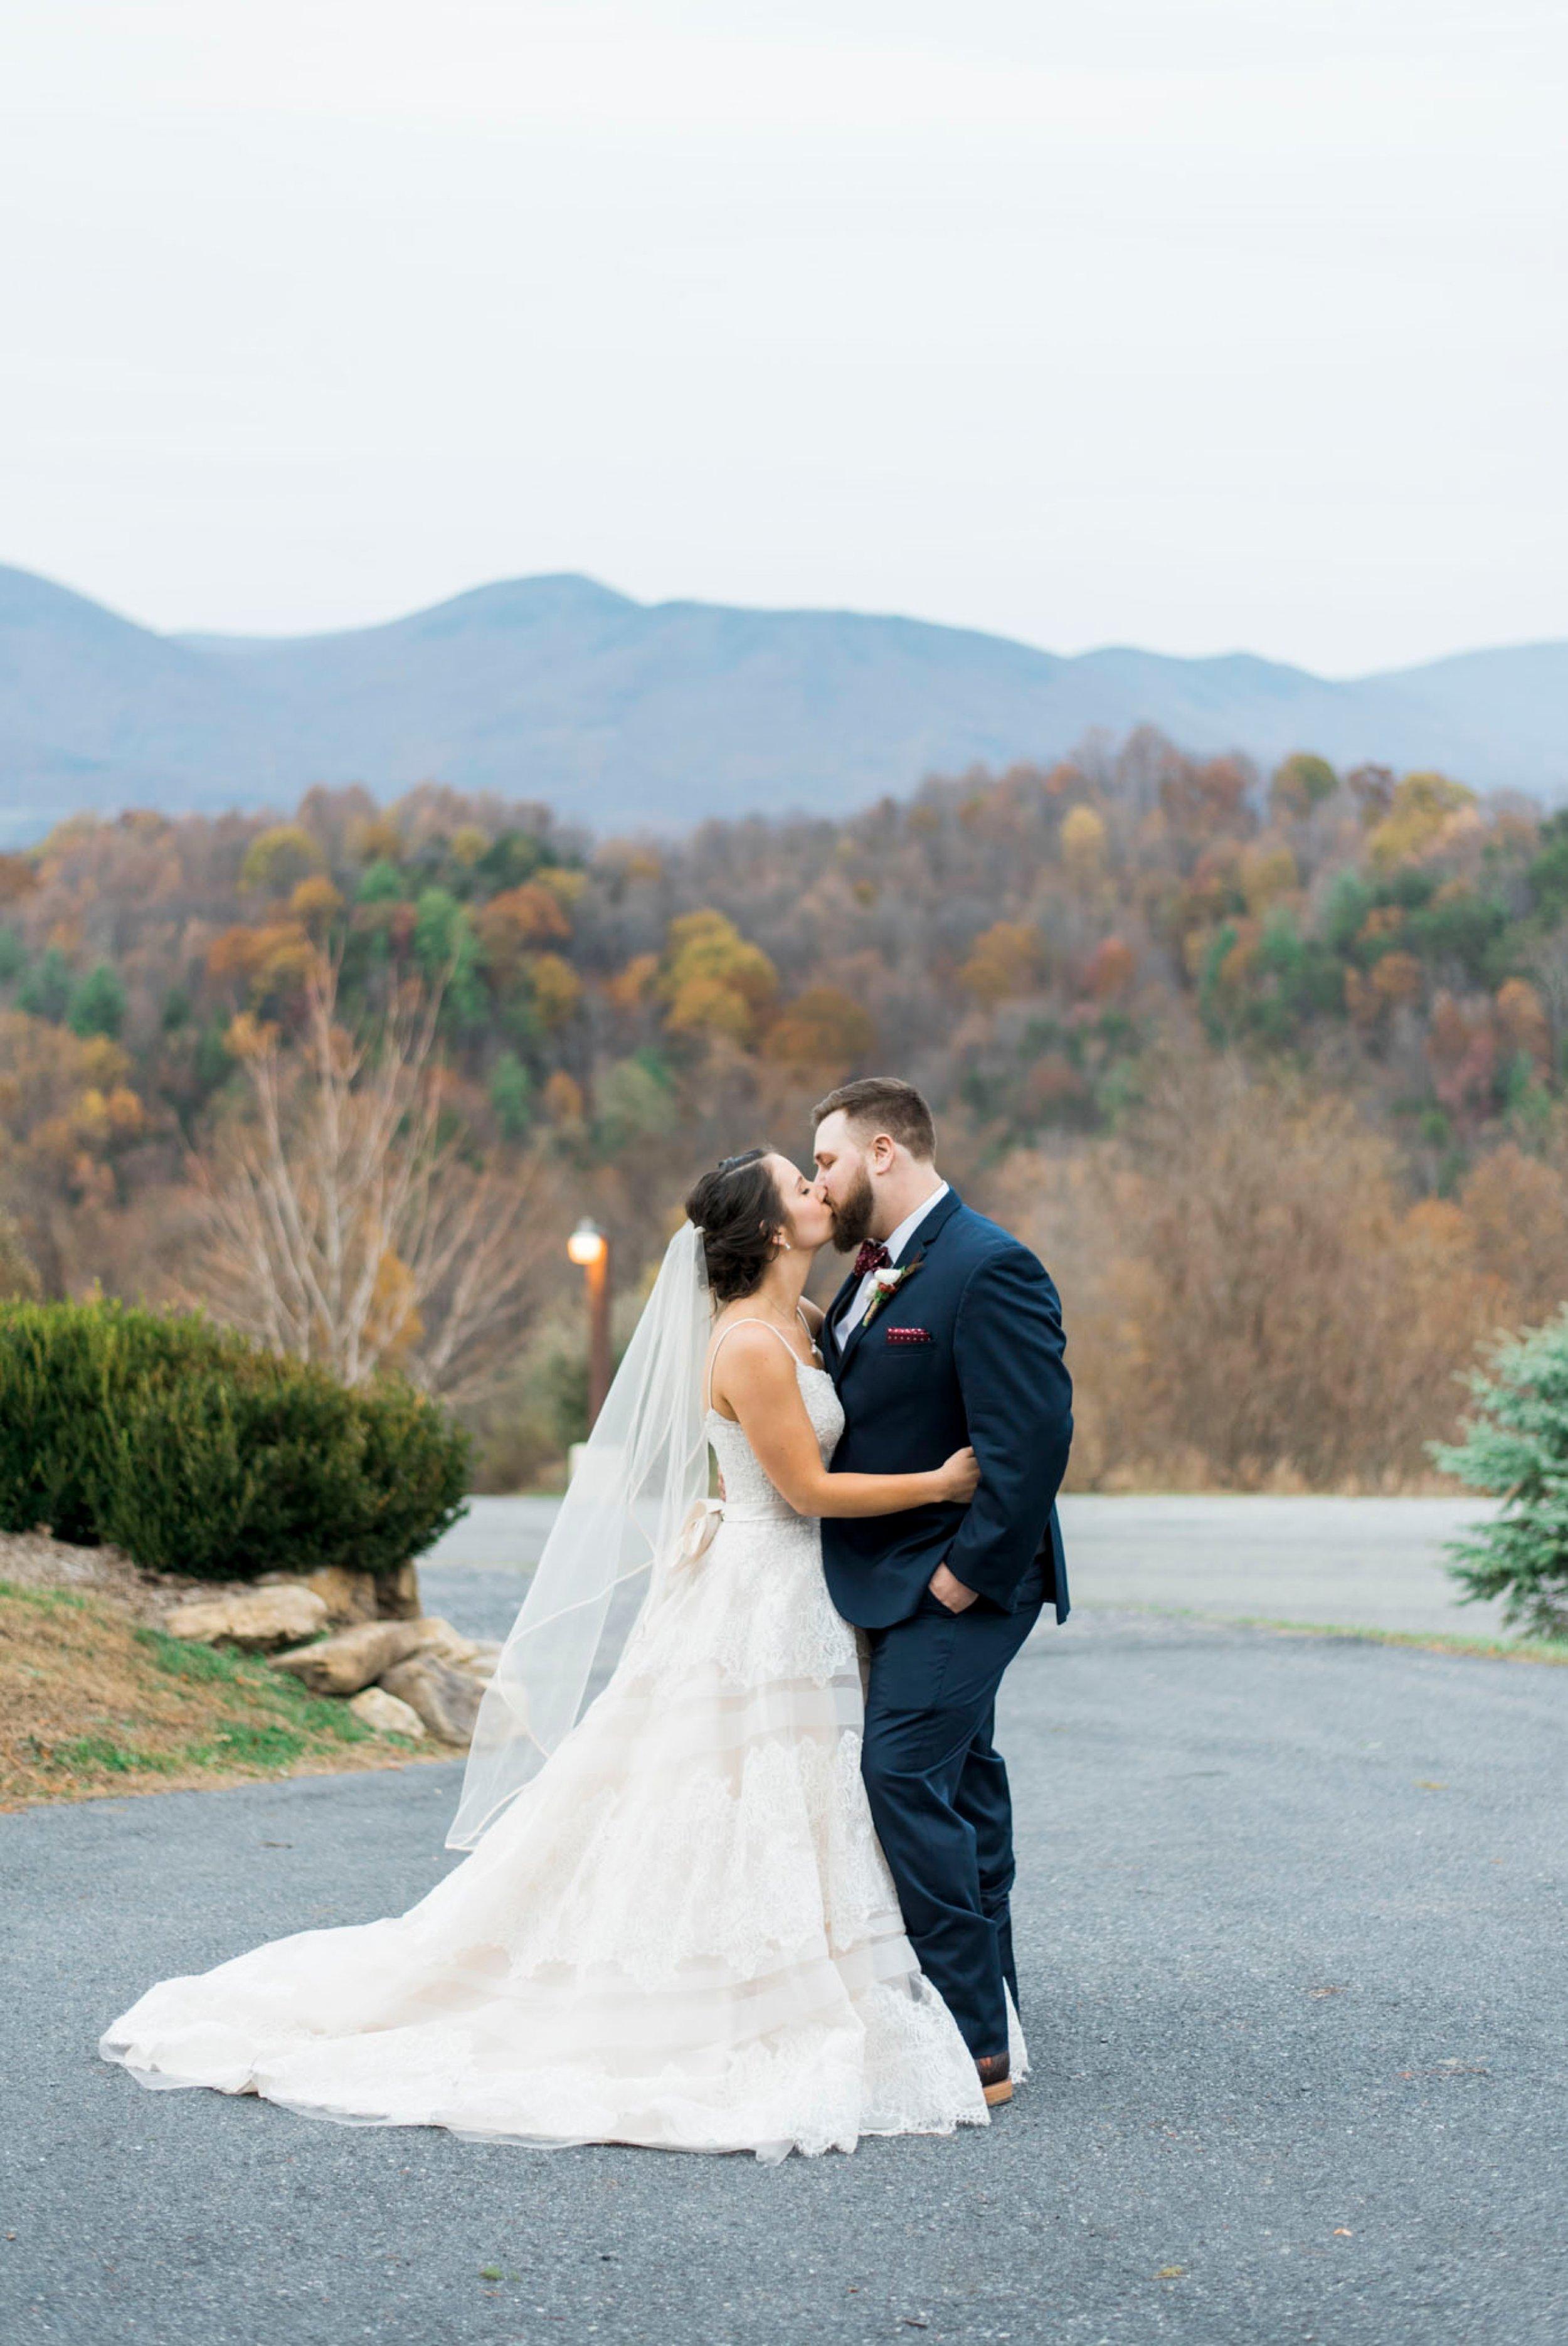 IrvineEstate_LexingtonVA_Wedding_FallWedding_VirginiaWeddingPhotographer 94.jpg